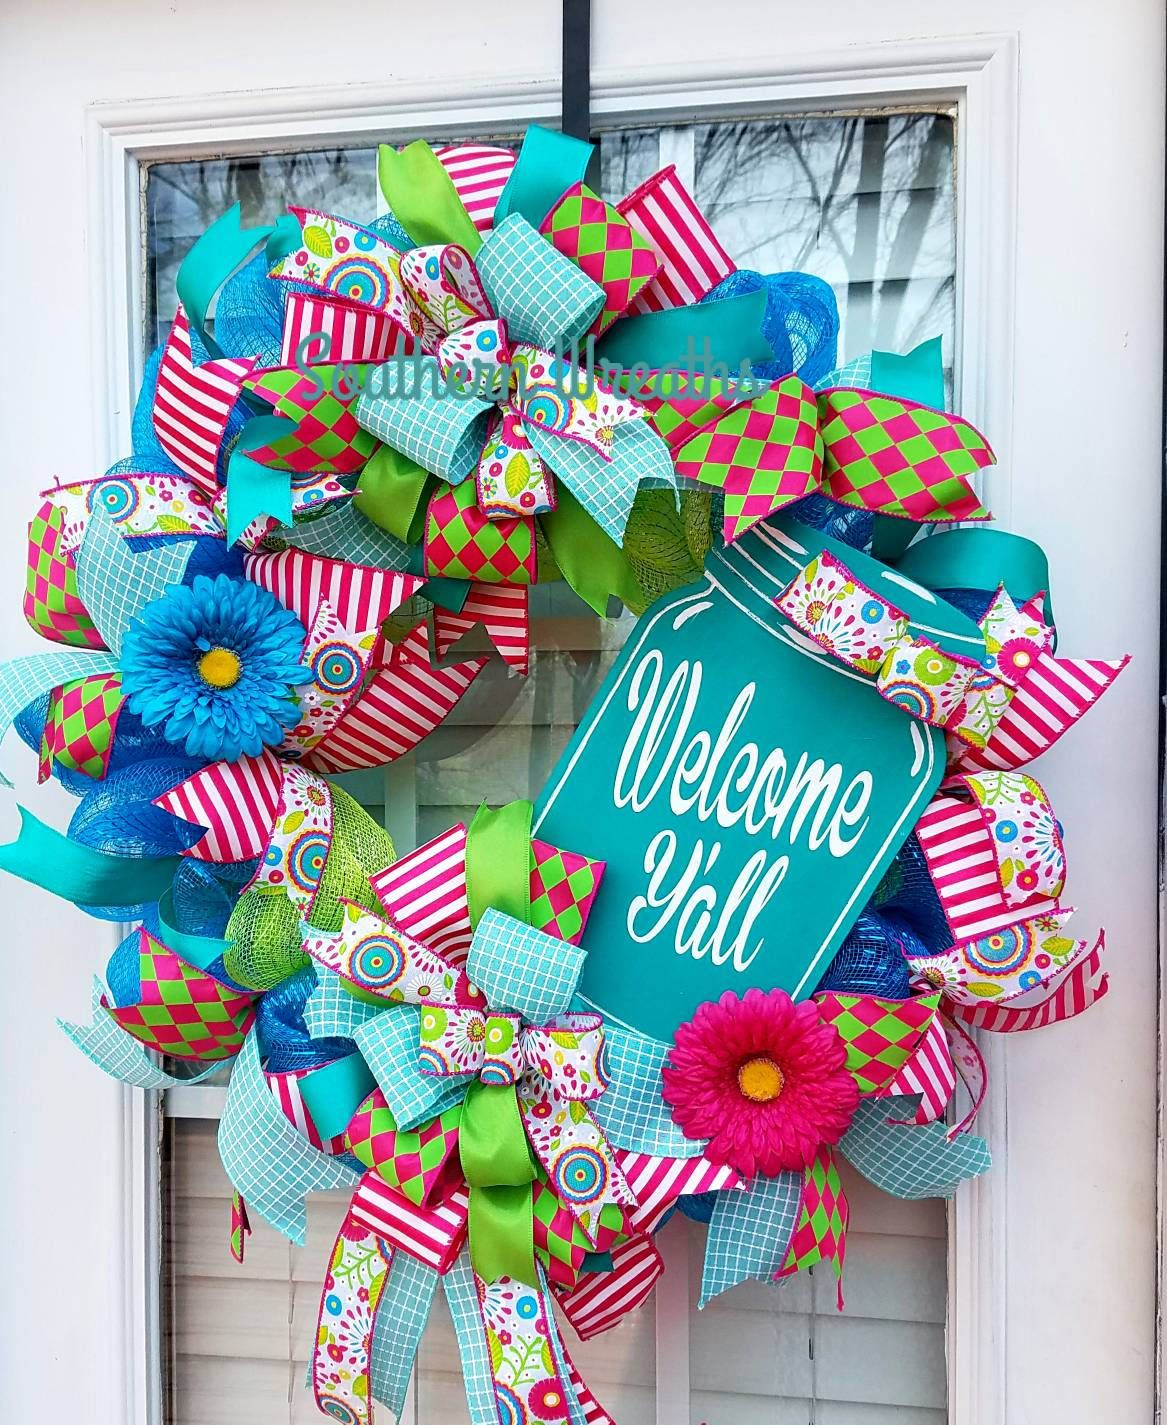 Welcome yall wreathmason jar wreath spring door wreath deco welcome yall wreathmason jar wreath spring door wreath deco mesh rubansaba